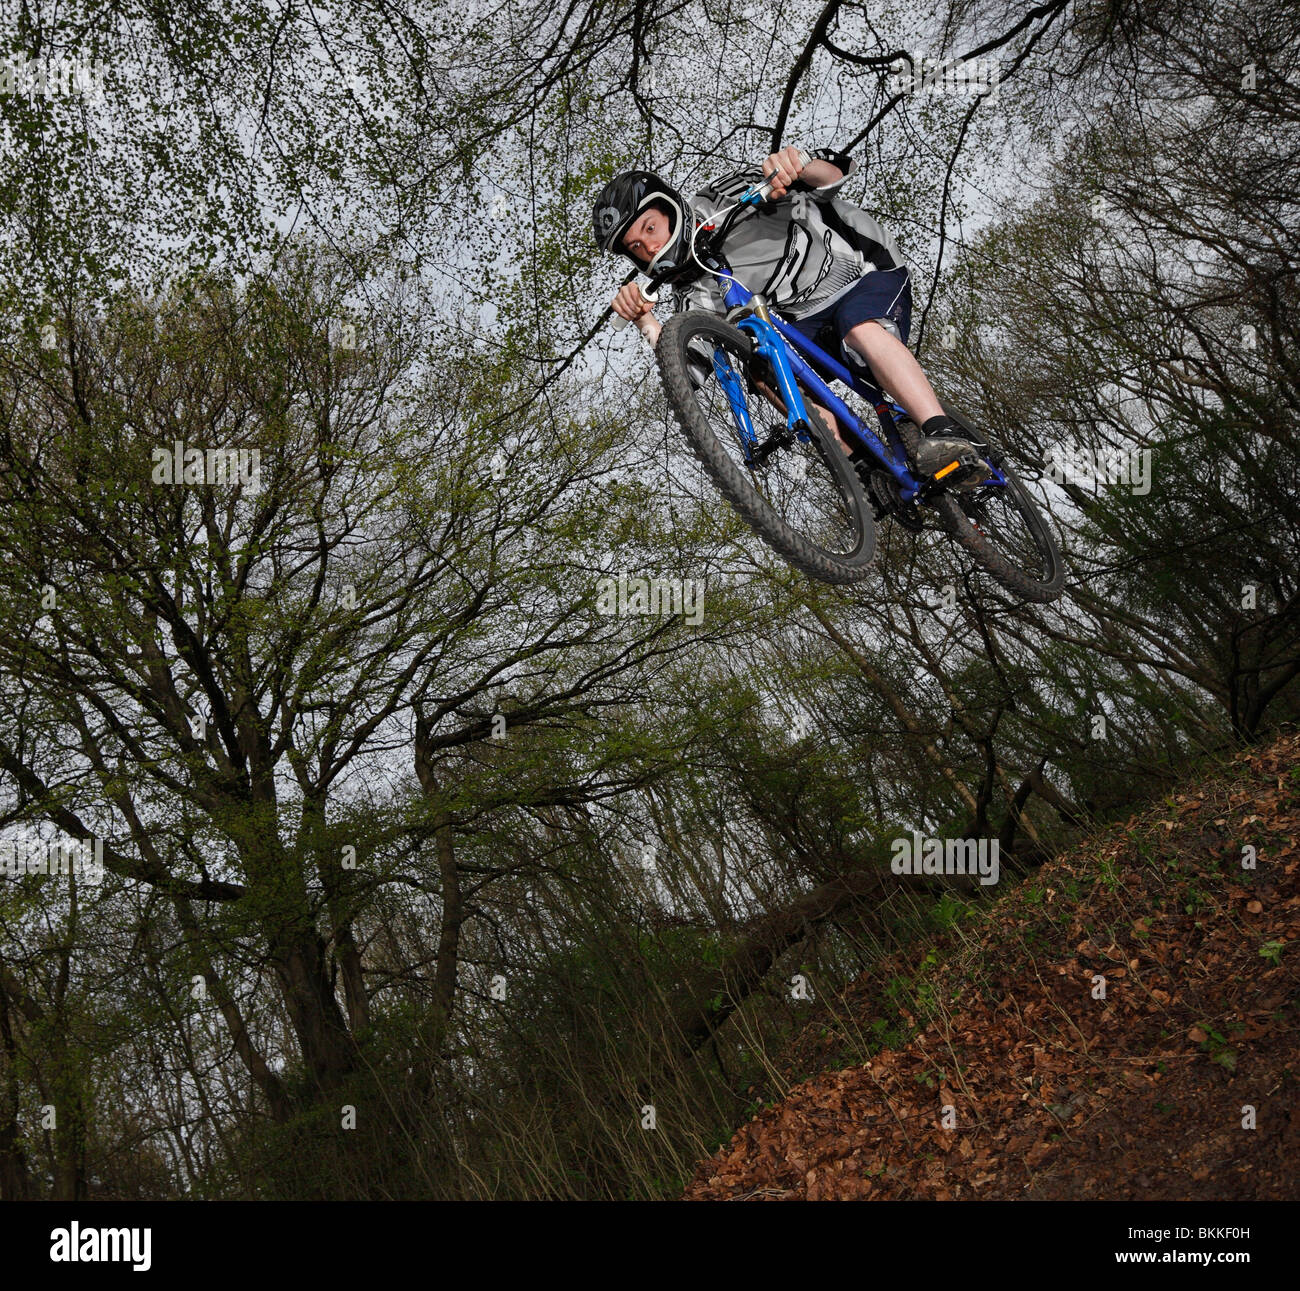 Freeriding dirt bike jumper. - Stock Image